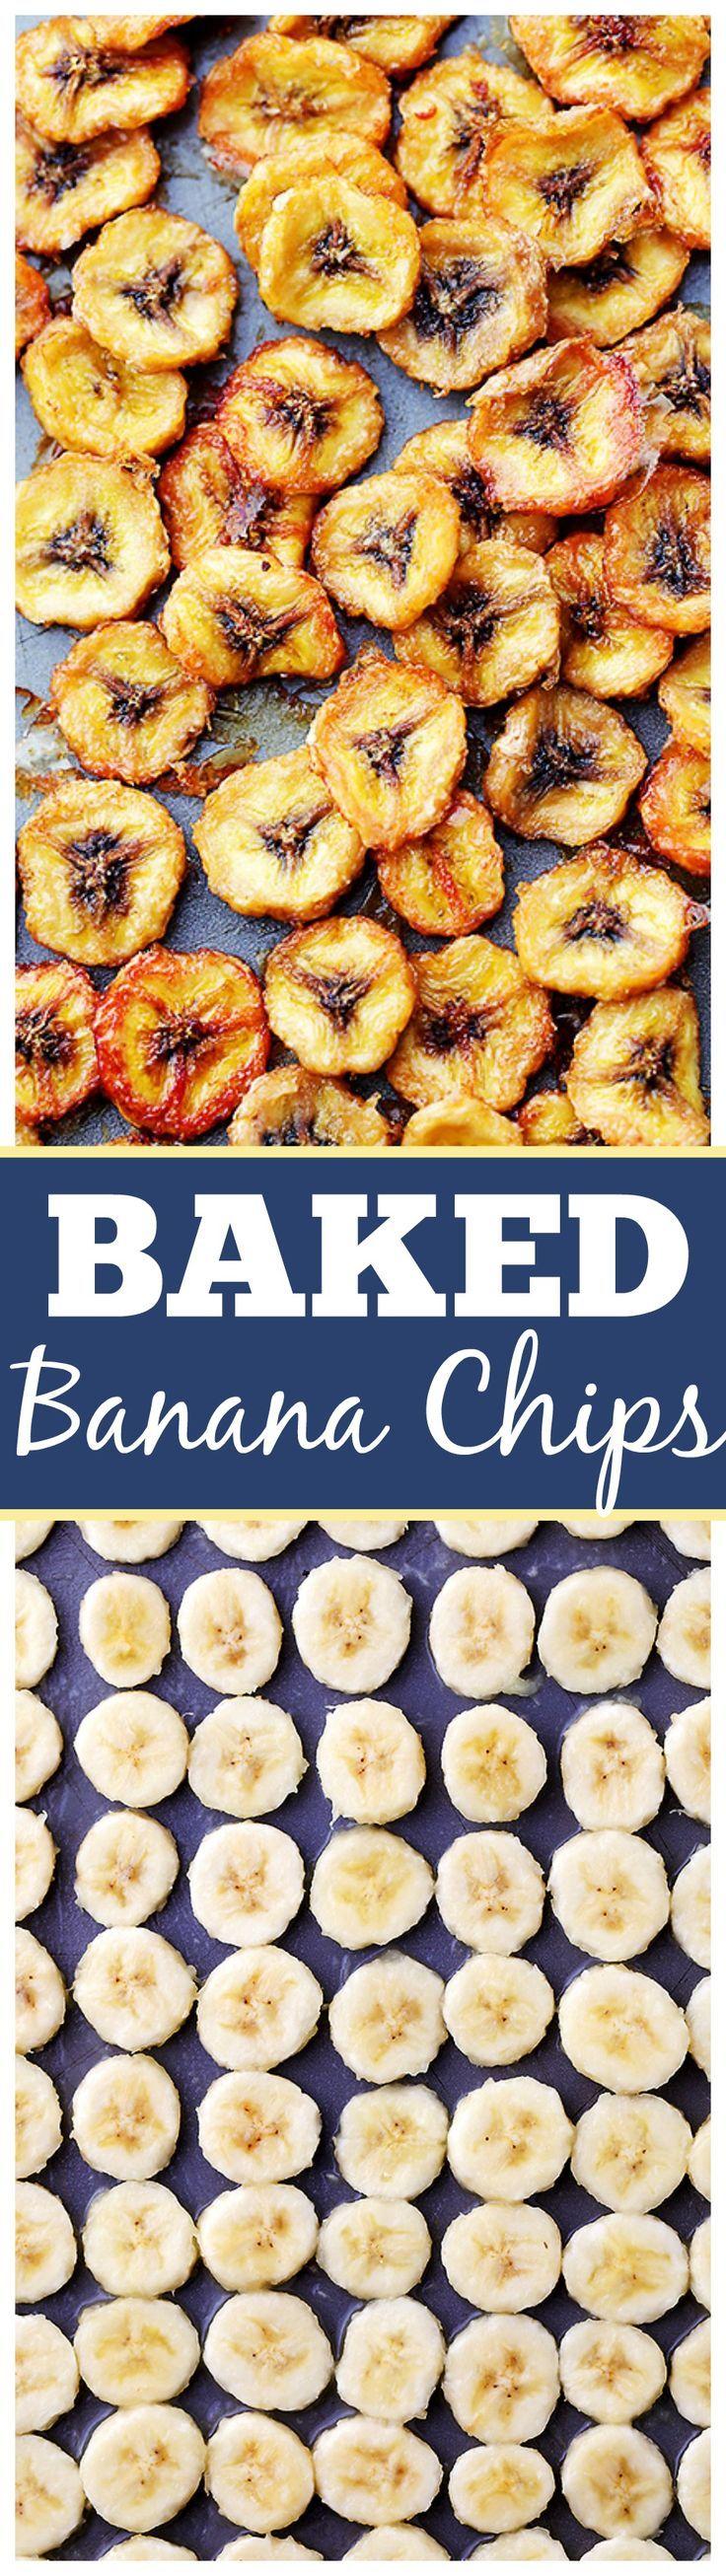 Homemade Baked Banana Chips – Deliciously sweet and guilt-free baked banana chip